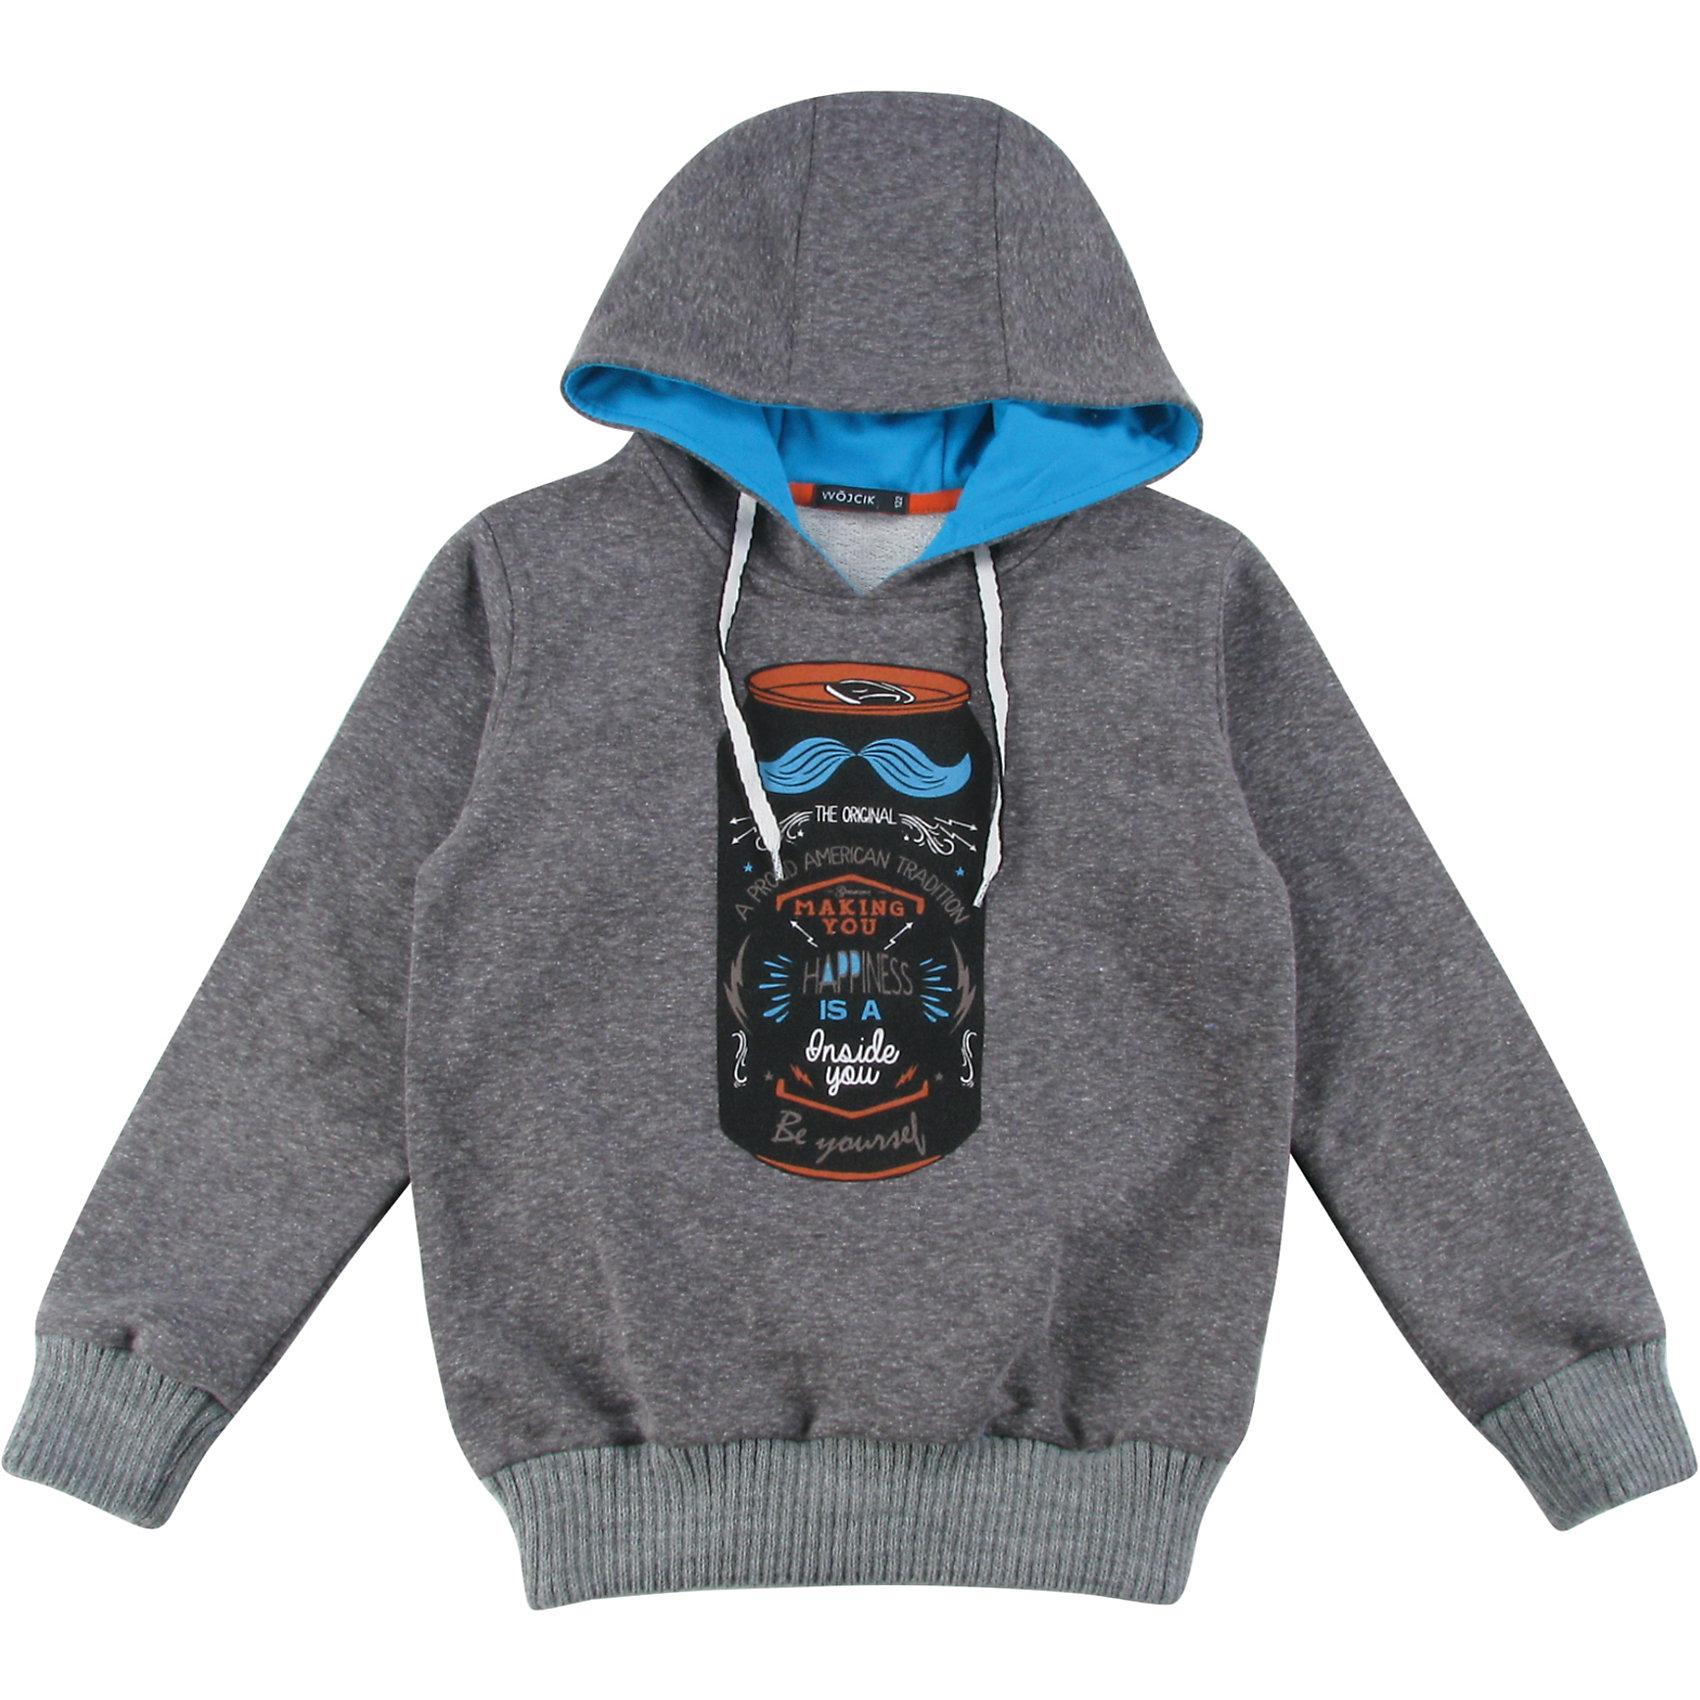 Толстовка для мальчика WojcikТолстовки, свитера, кардиганы<br>Толстовка для мальчика Wojcik<br>Состав:<br>Хлопок 97% Эластан 3%<br><br>Ширина мм: 190<br>Глубина мм: 74<br>Высота мм: 229<br>Вес г: 236<br>Цвет: серый<br>Возраст от месяцев: 96<br>Возраст до месяцев: 108<br>Пол: Мужской<br>Возраст: Детский<br>Размер: 134,92,98,104,110,116,122,128<br>SKU: 5592094